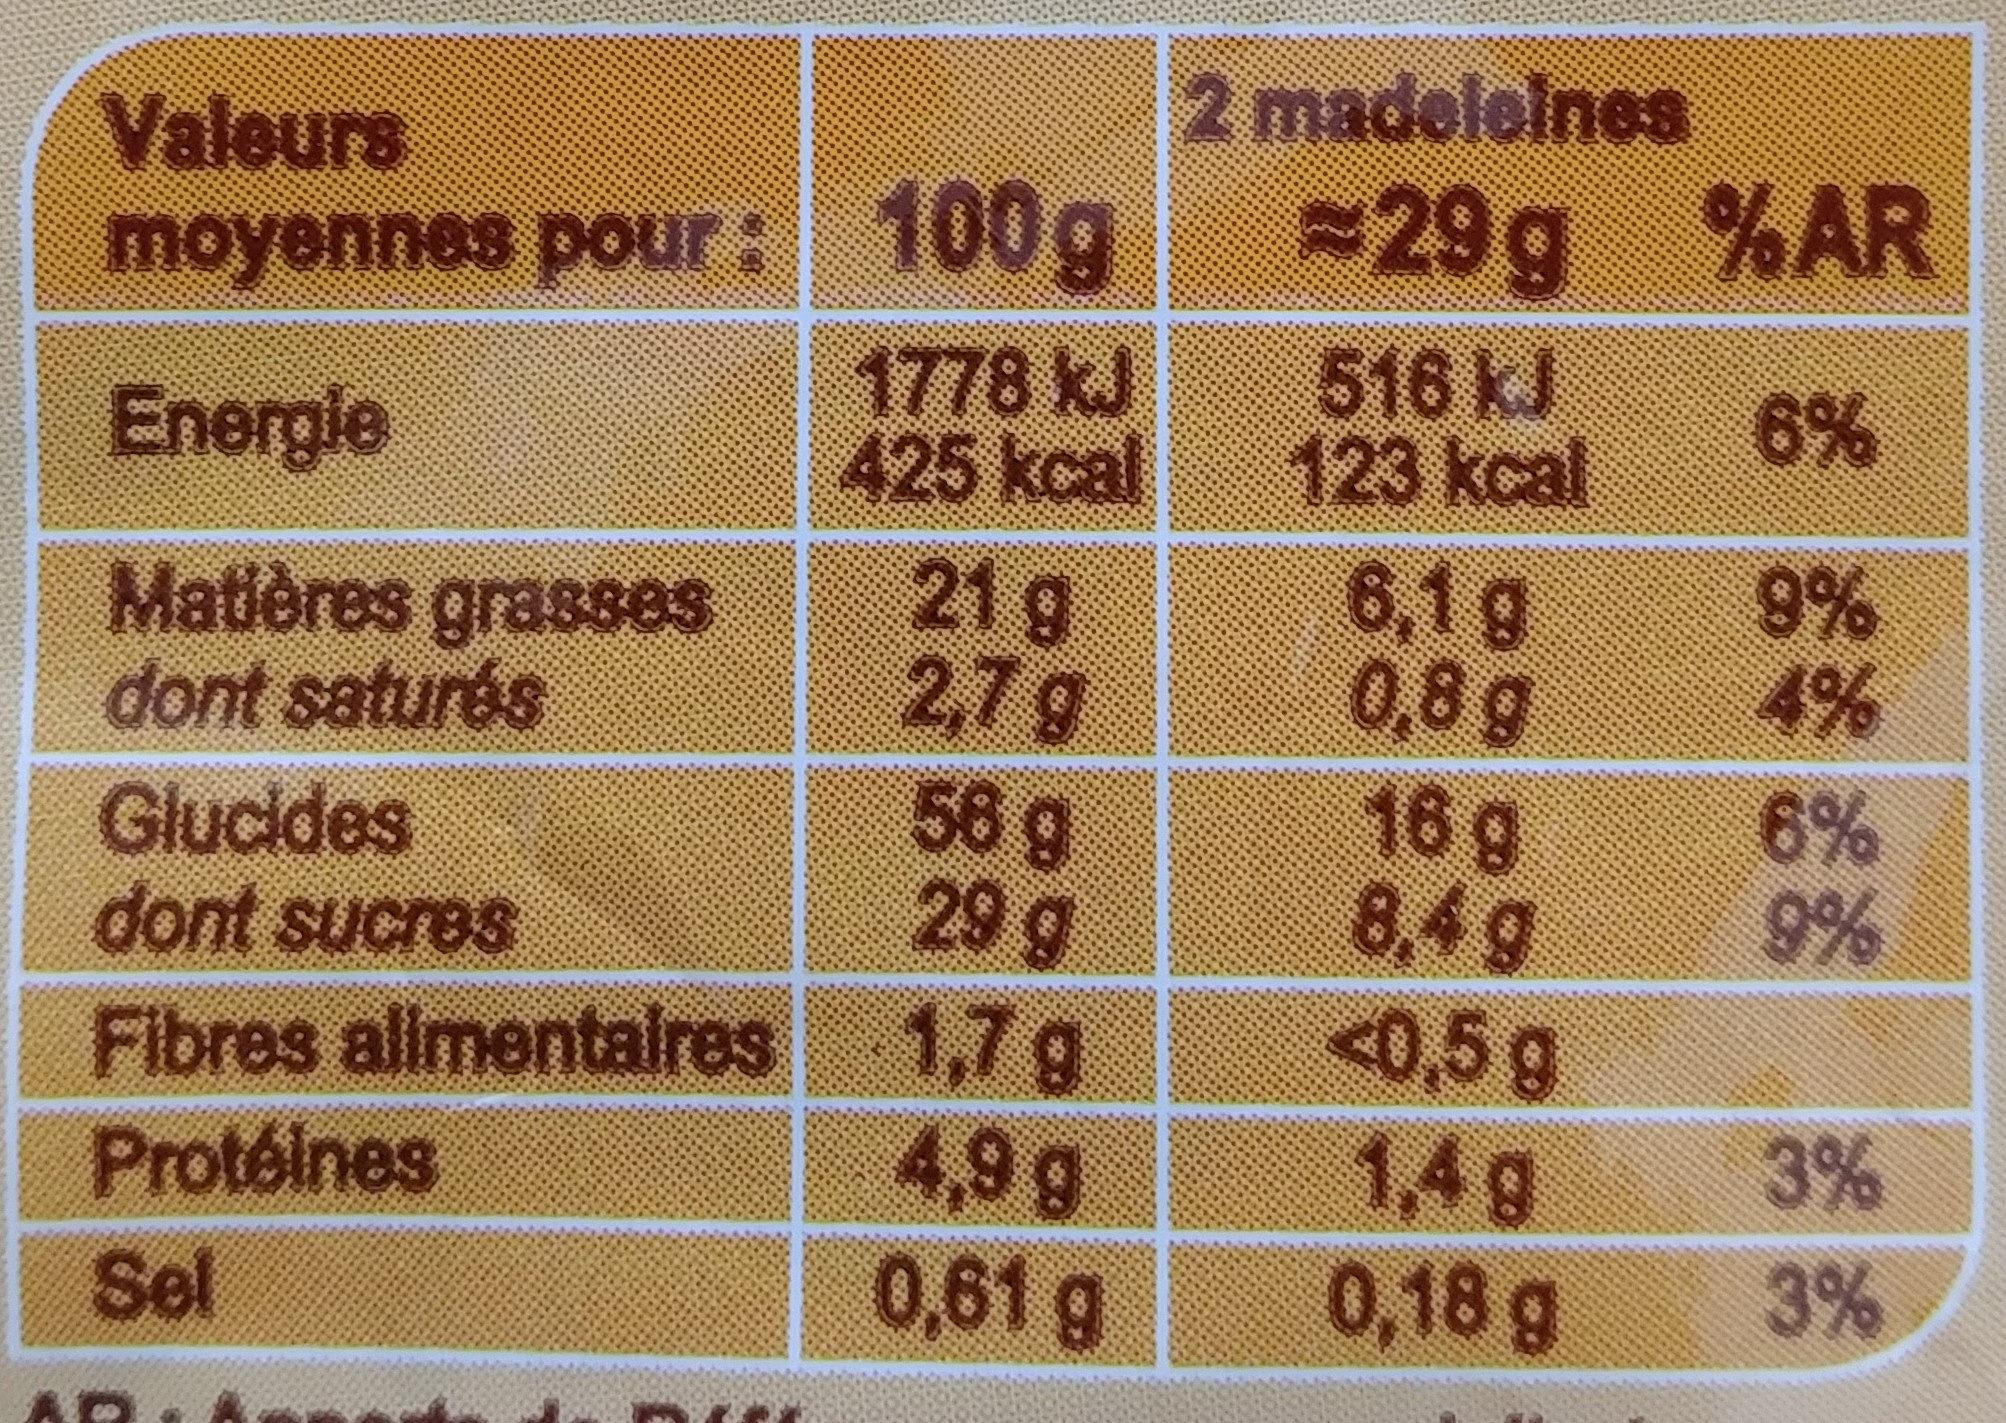 Madeleines Coquilles Marbrées au chocolat - Informations nutritionnelles